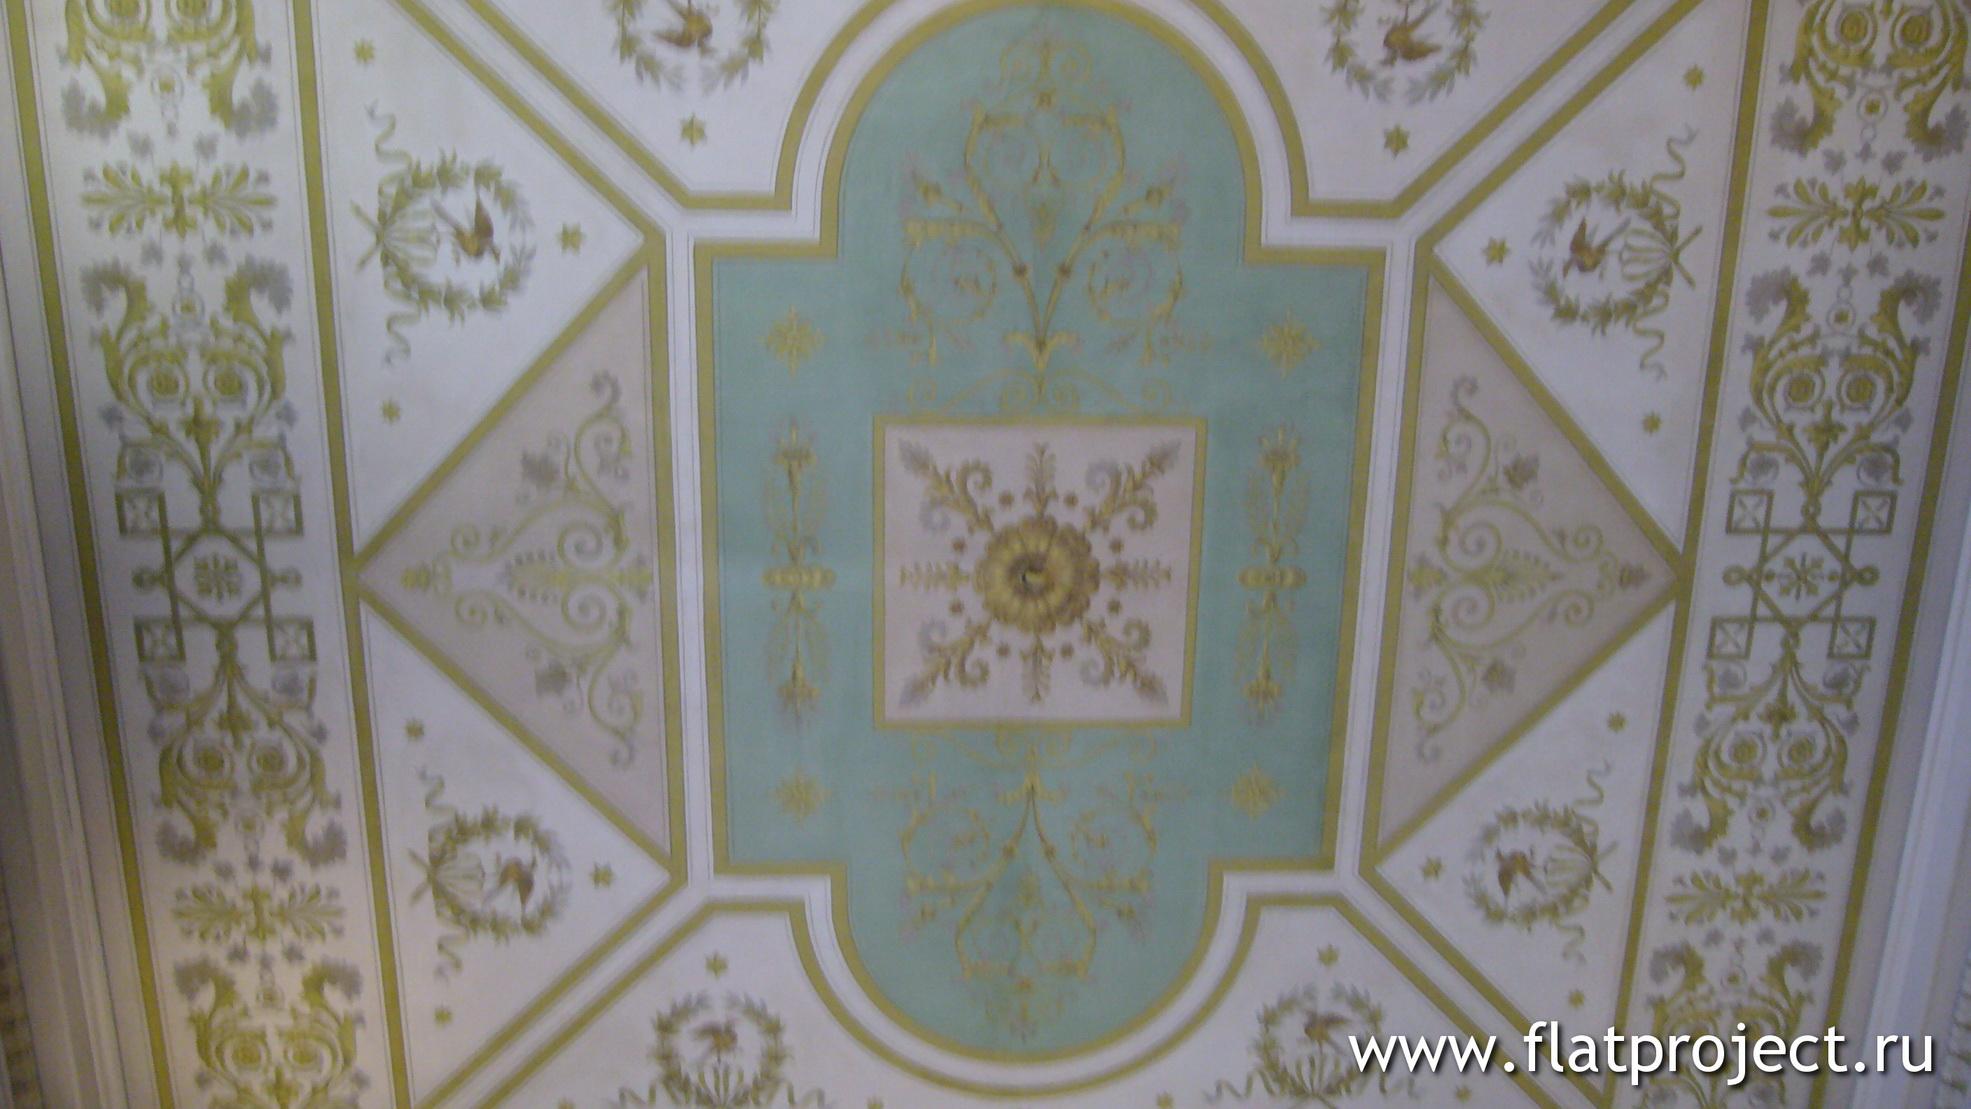 The State Hermitage museum interiors – photo 216